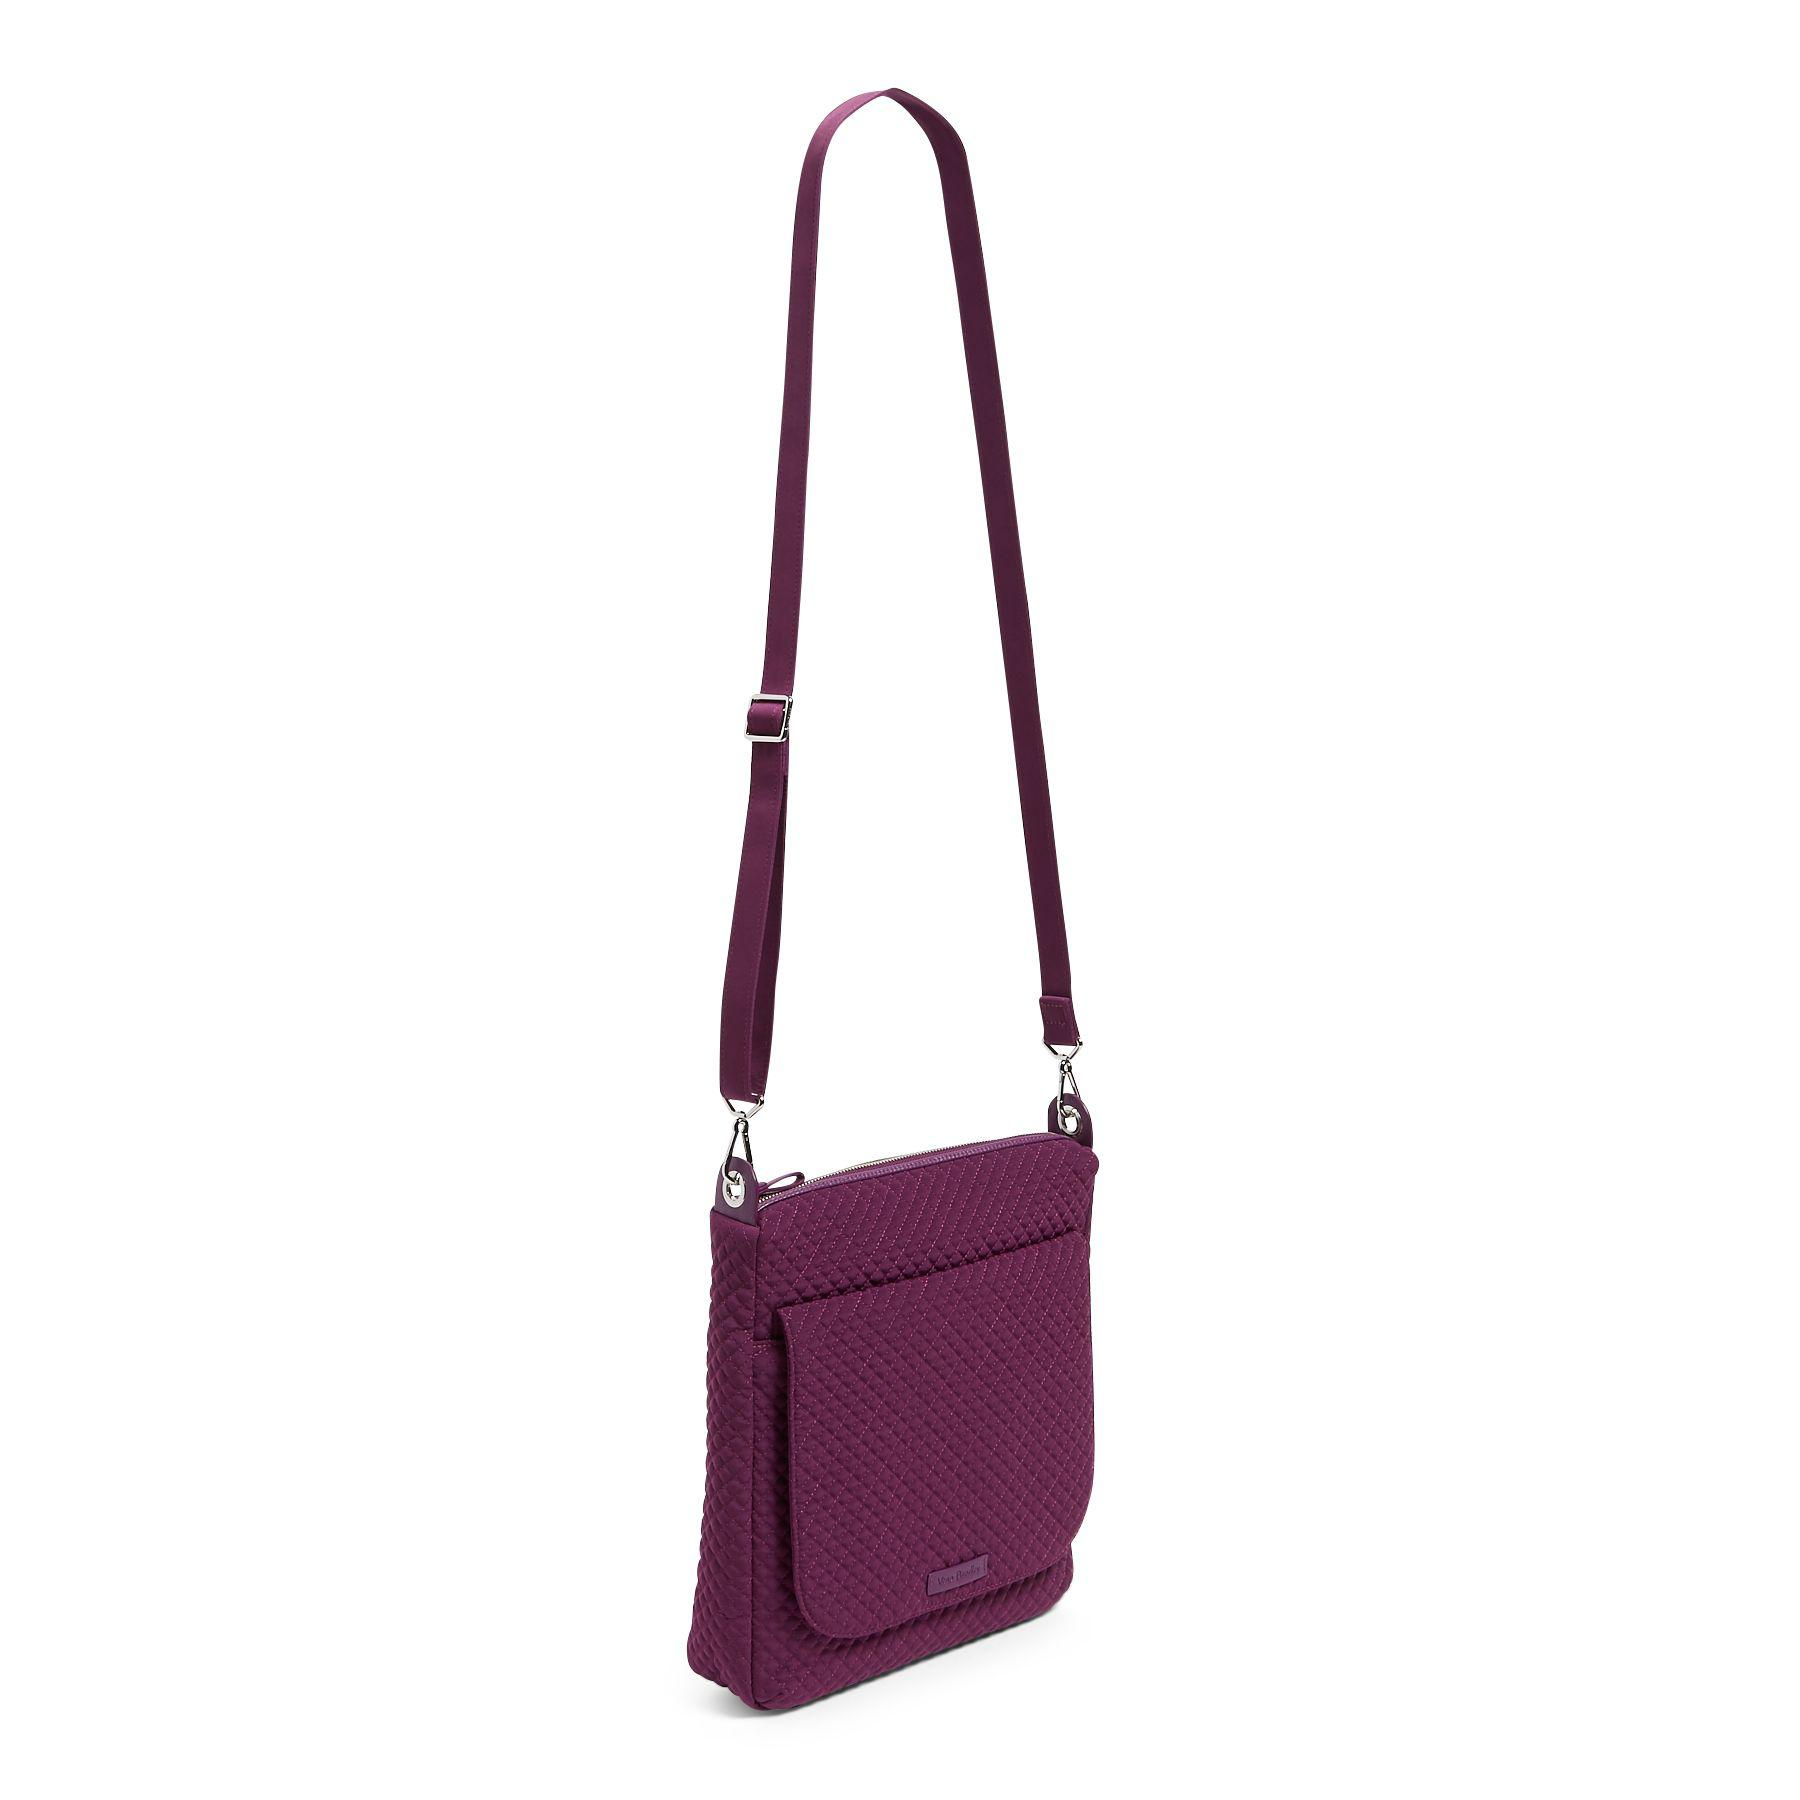 Lyst - Vera Bradley Carson Solid Cross-body Mailbag in Purple ed568ed57